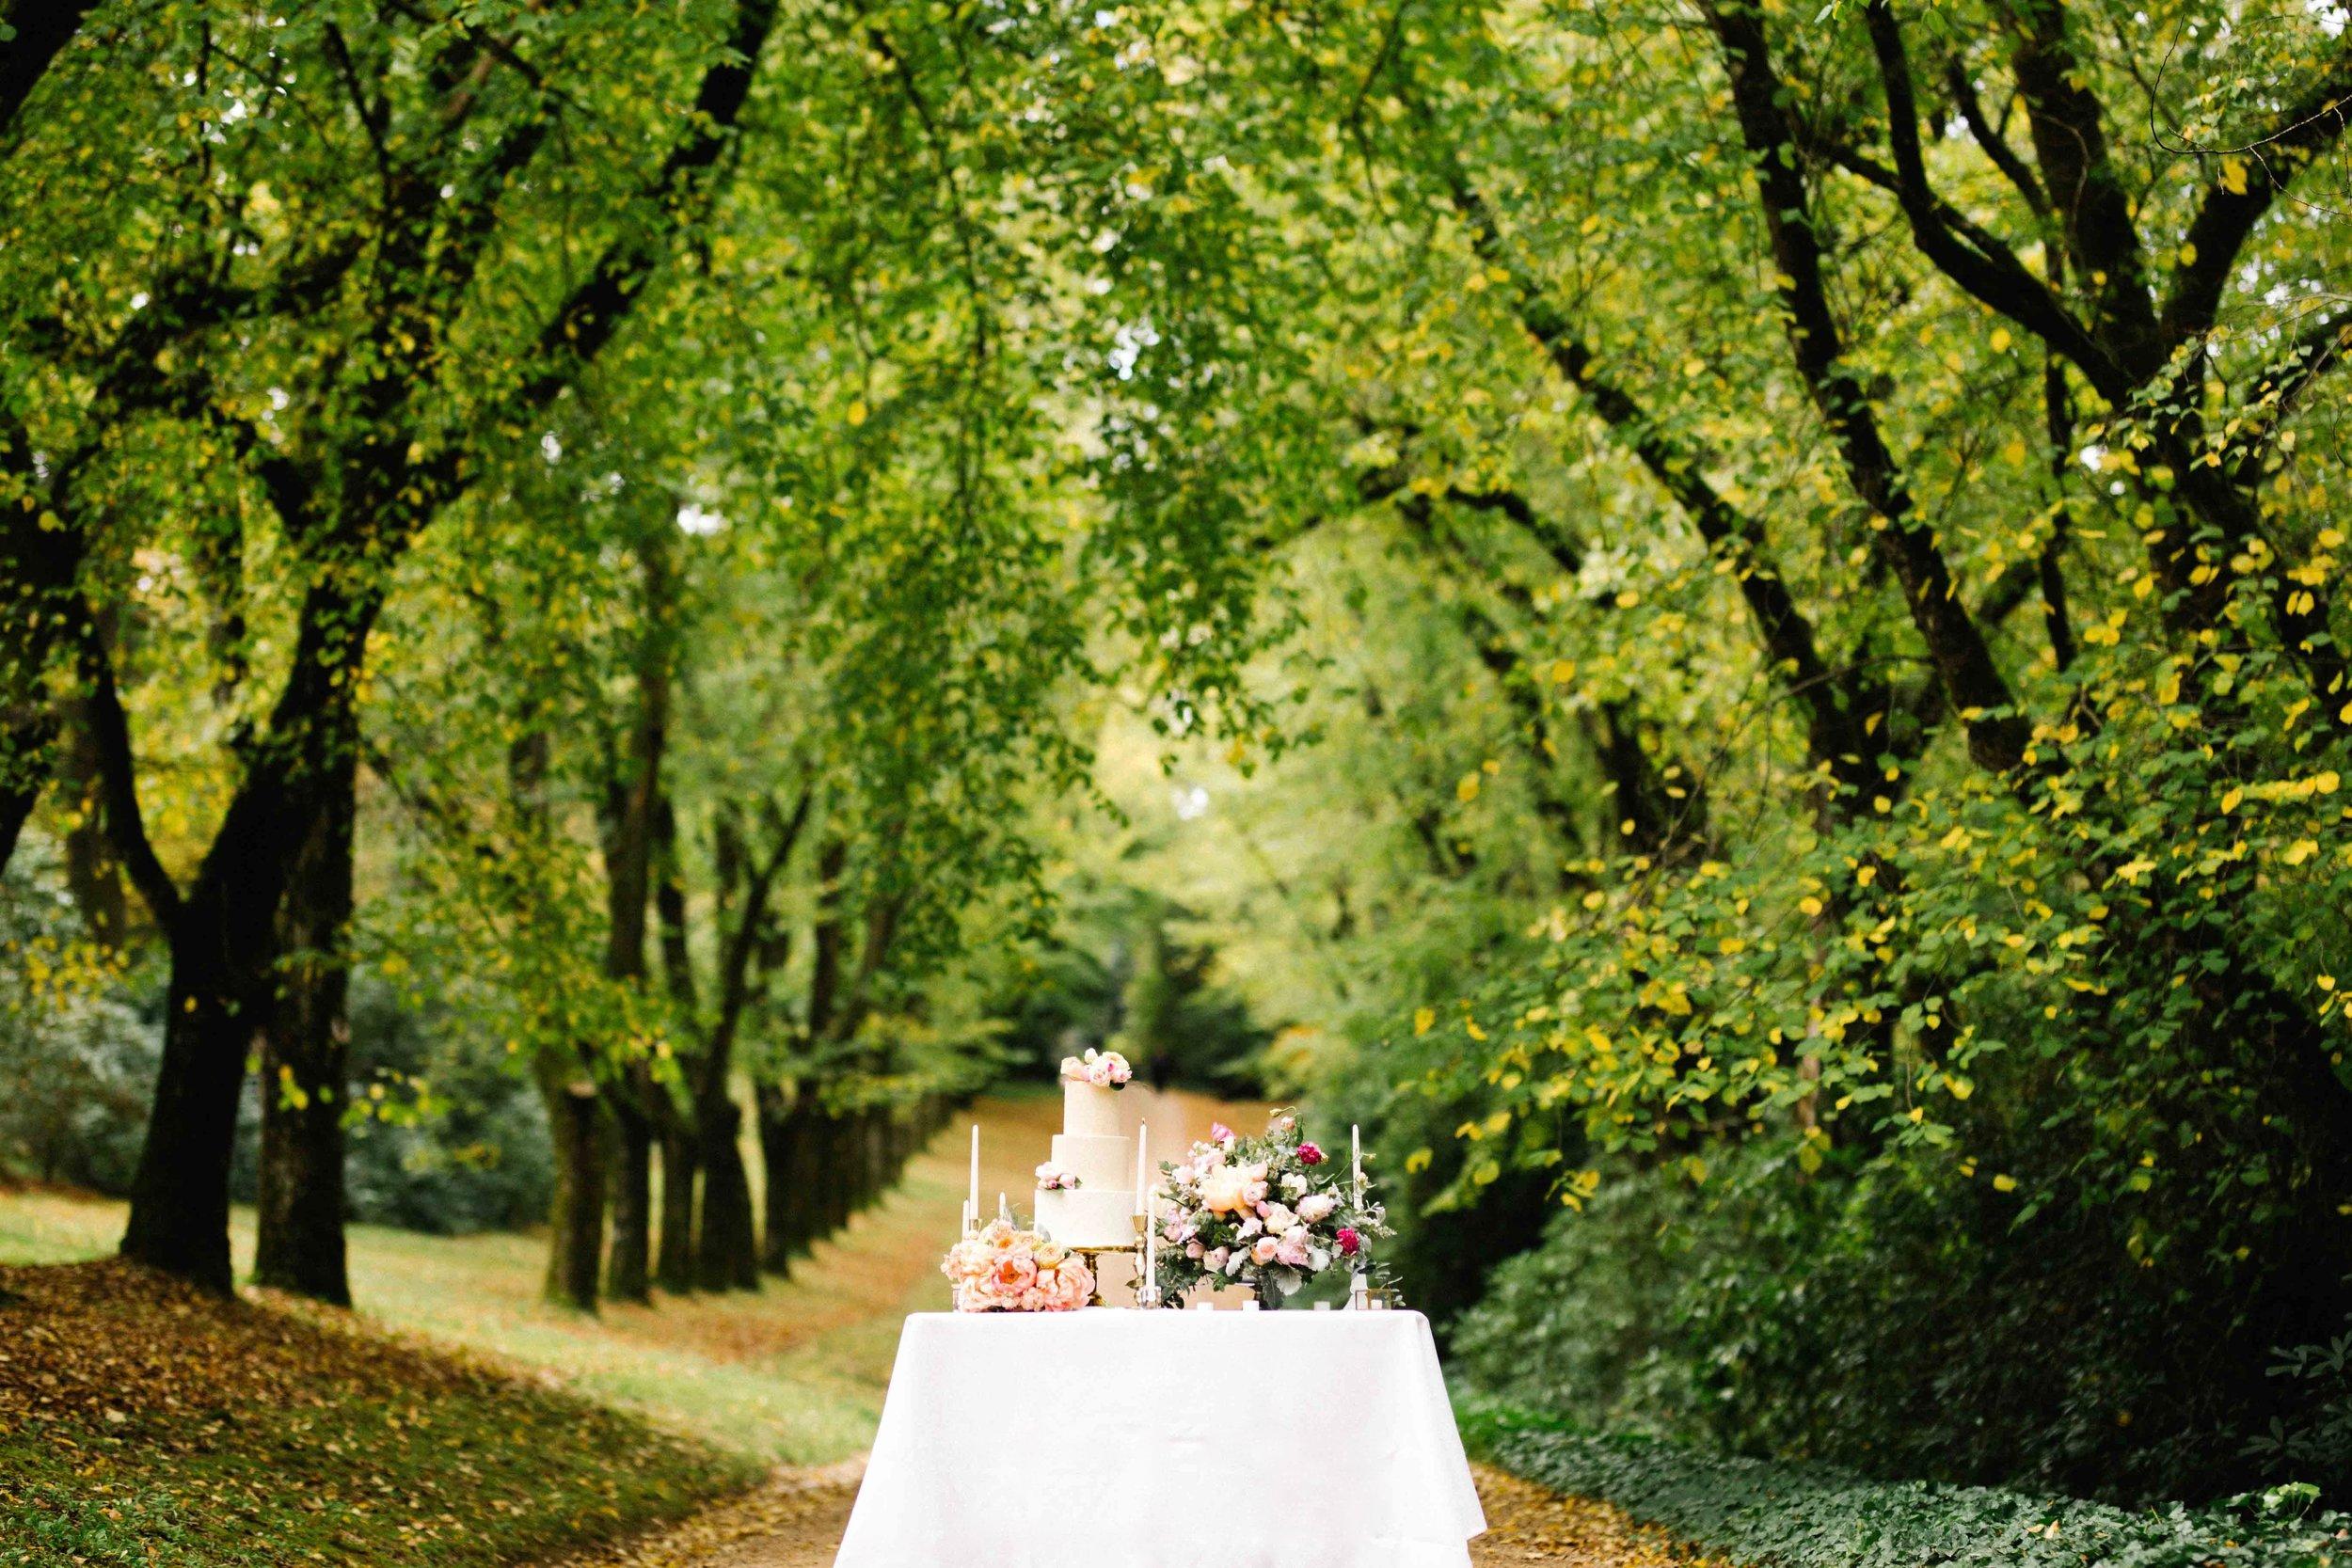 Dancing & Dessert Autumn Wedding Cake Table